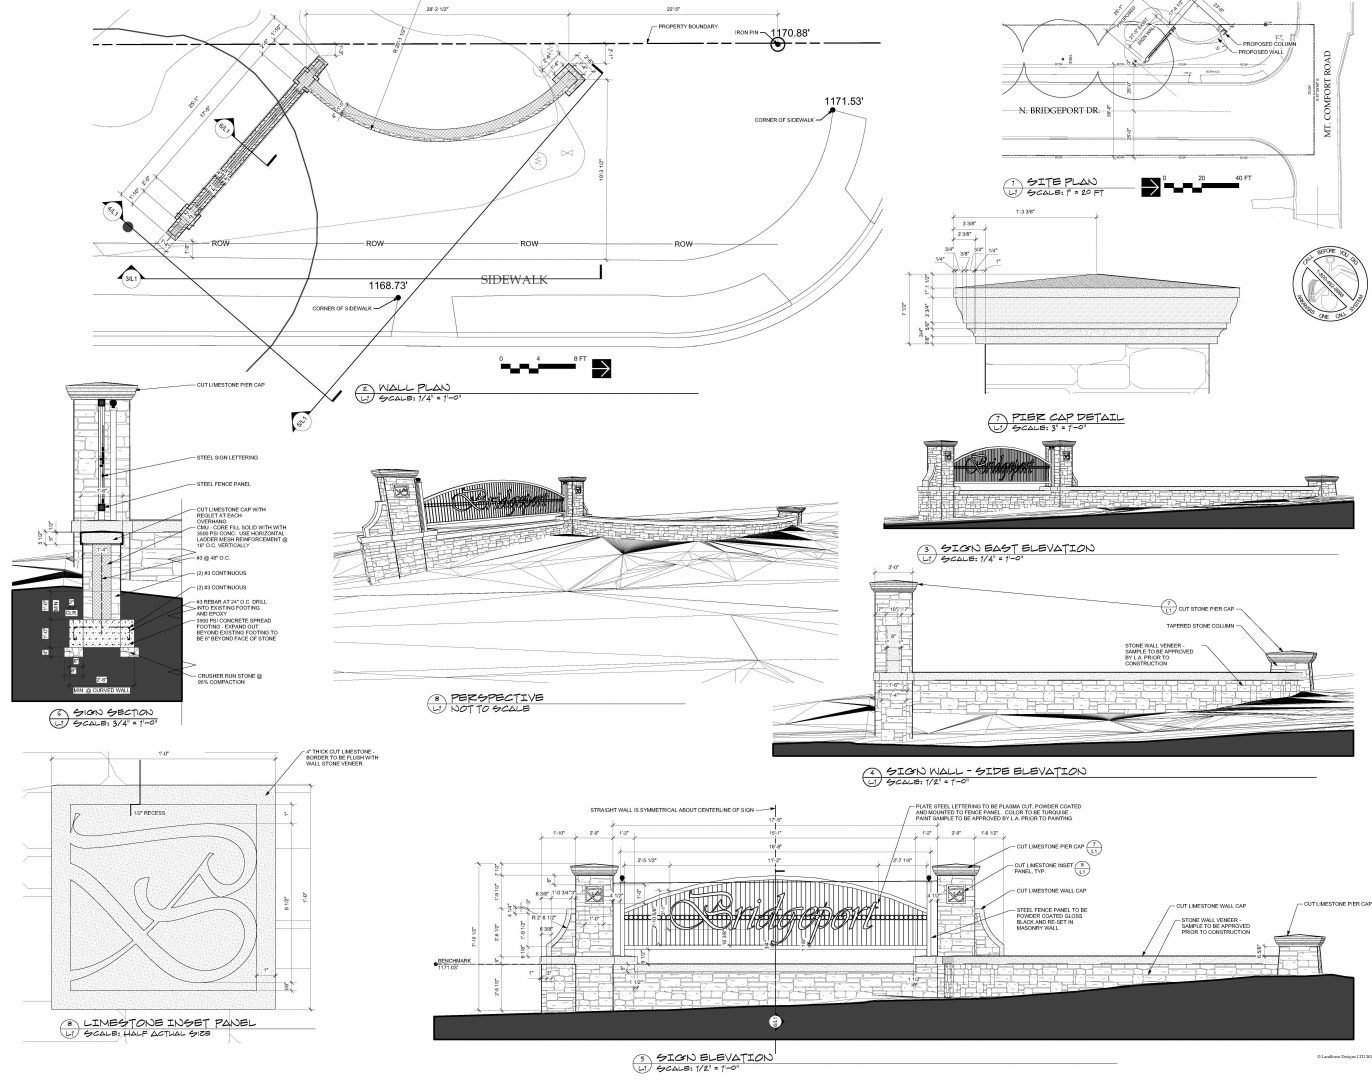 the masterplan for bridgeport